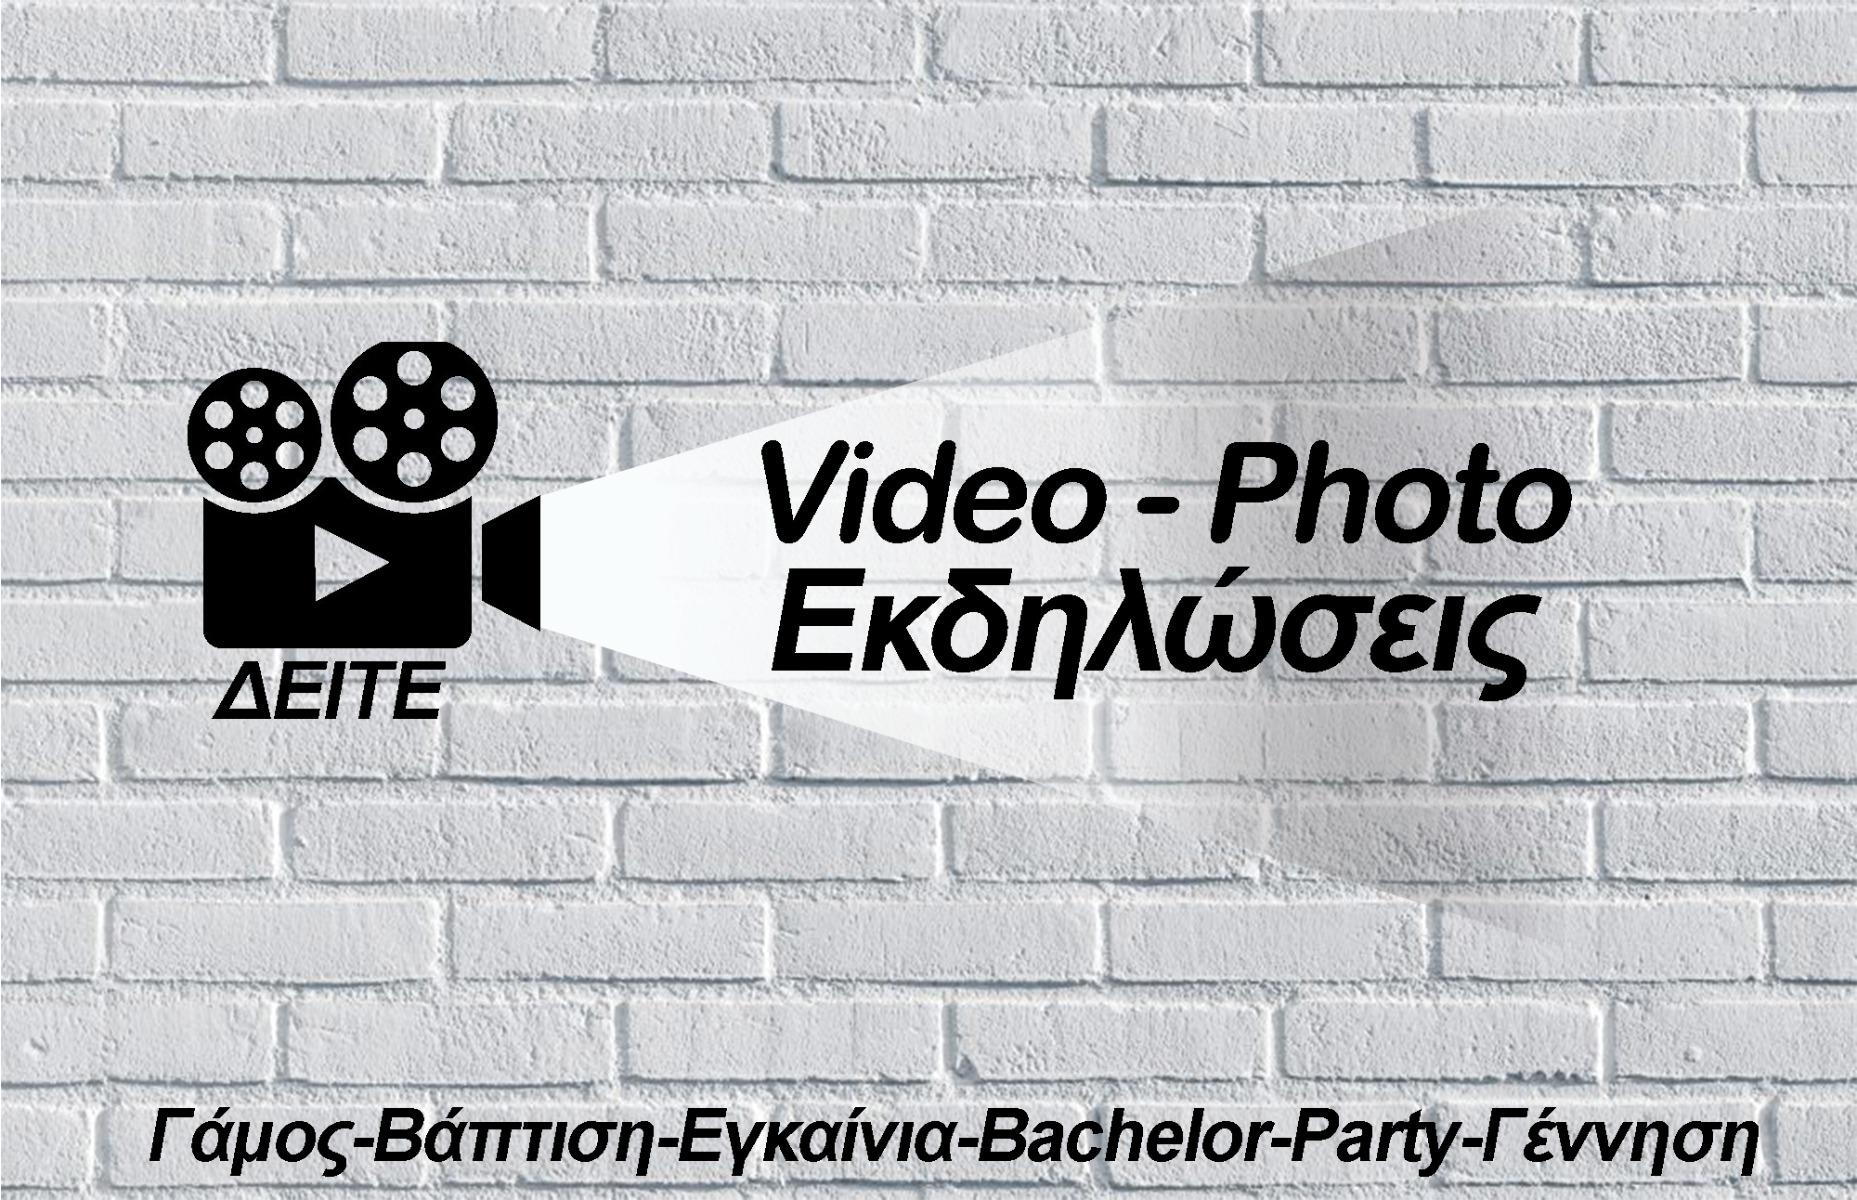 Blog / Εκδηλώσεις / Video